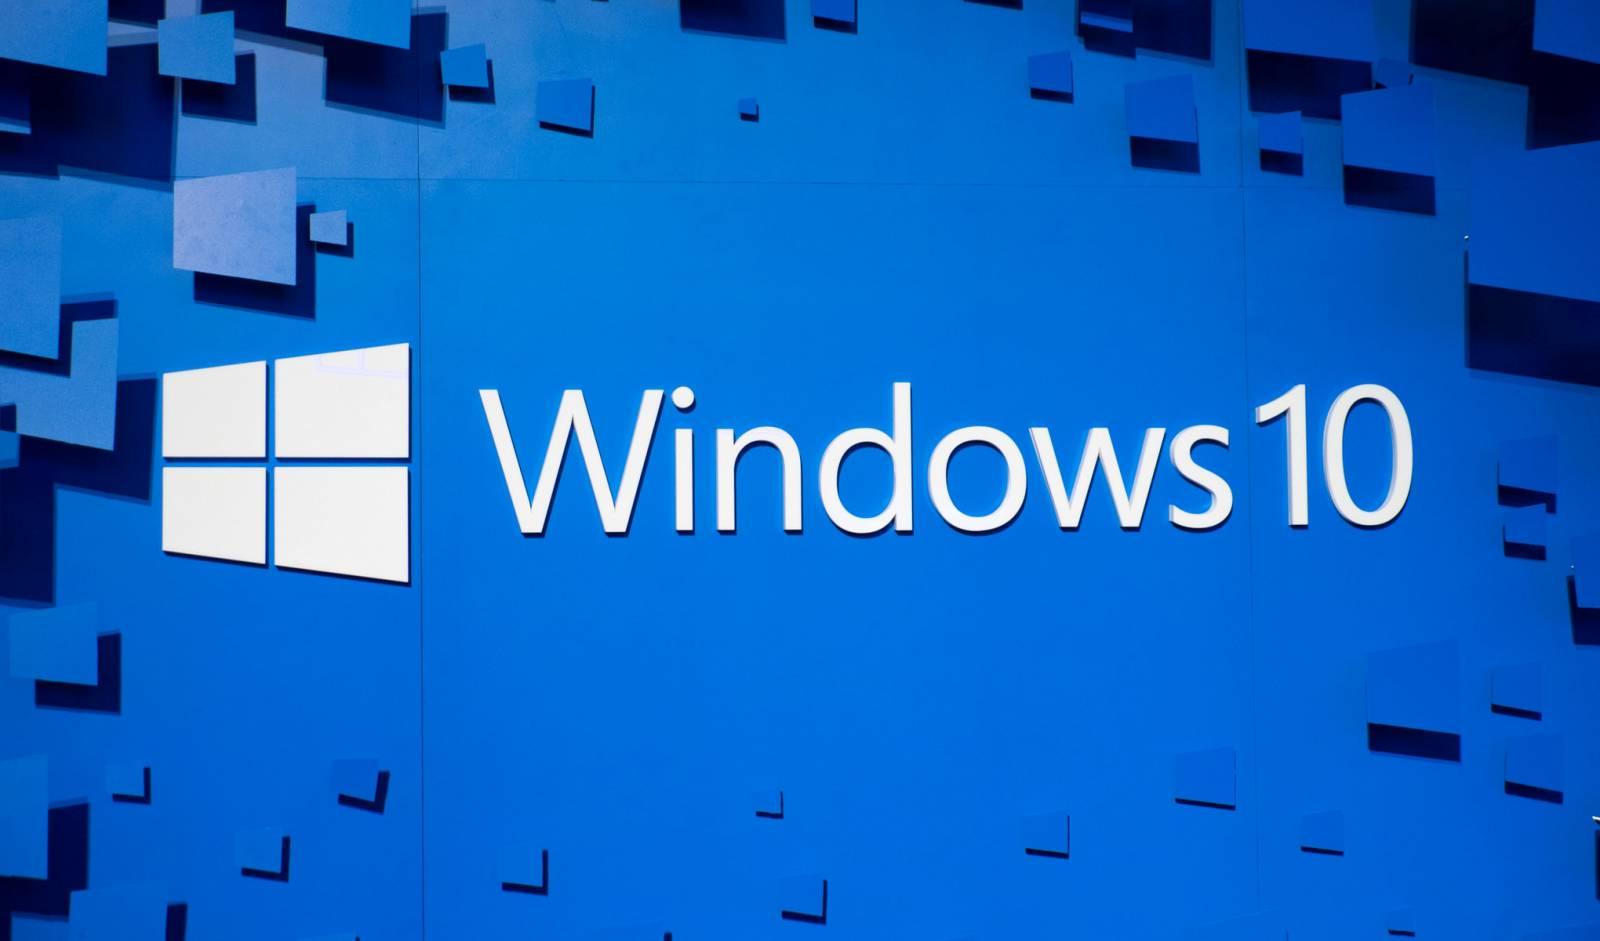 Windows 10 update 19h2